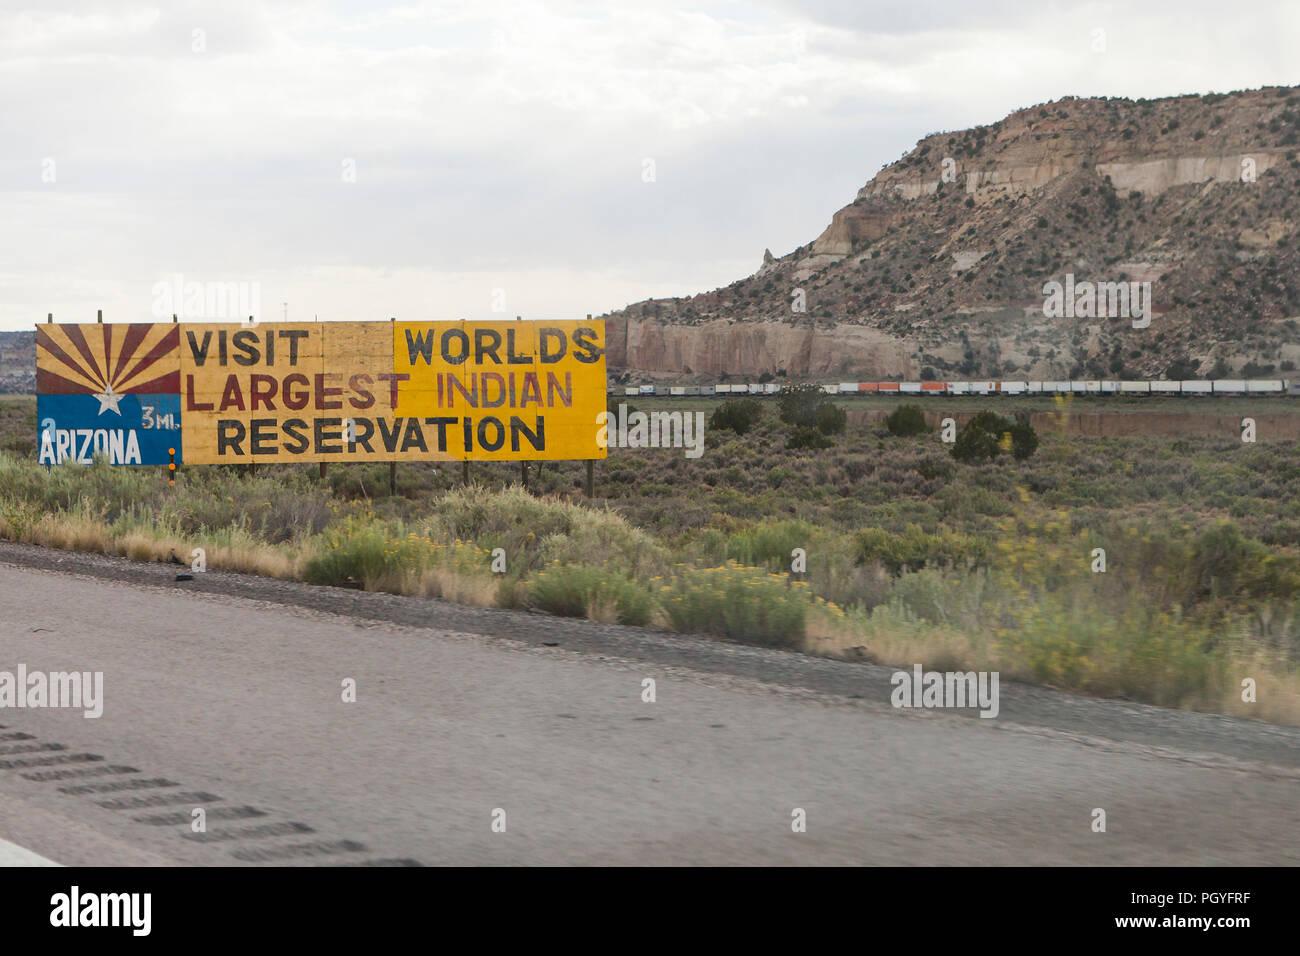 Indian reservation advertisement highway billboard - Arizona USA - Stock Image